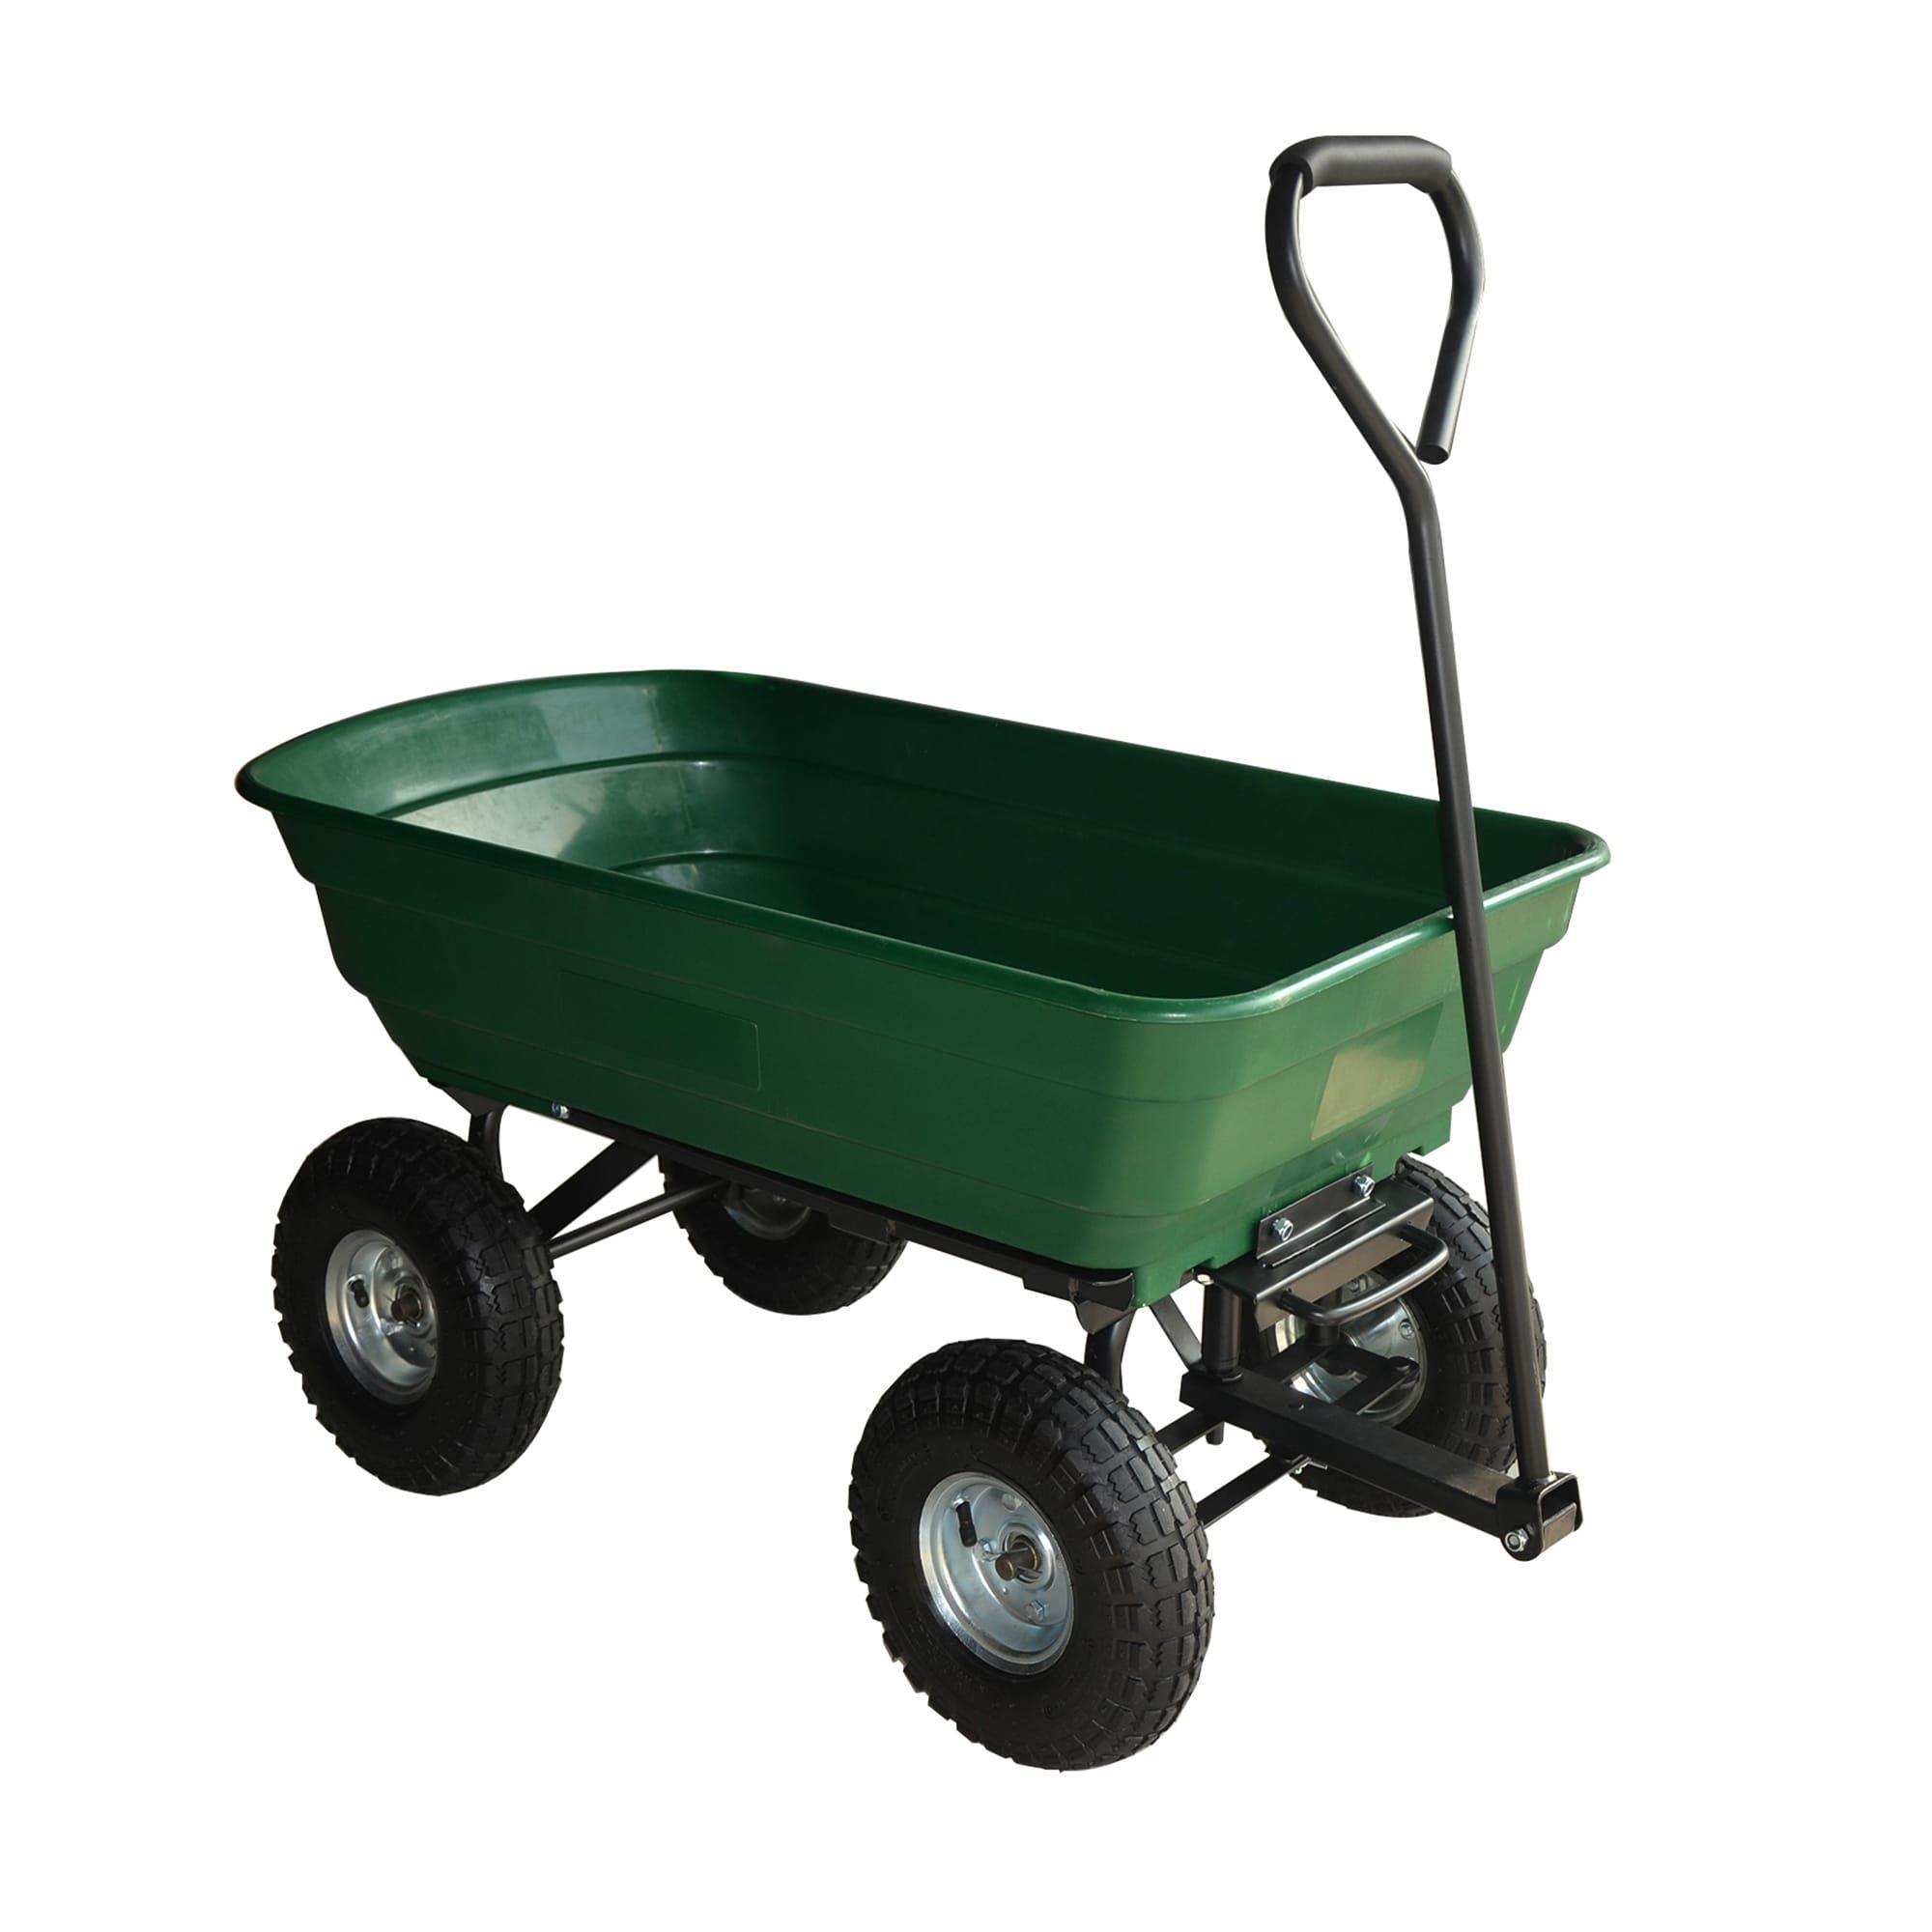 Sontax Garden Dump Cart, Green, Gardening | Products